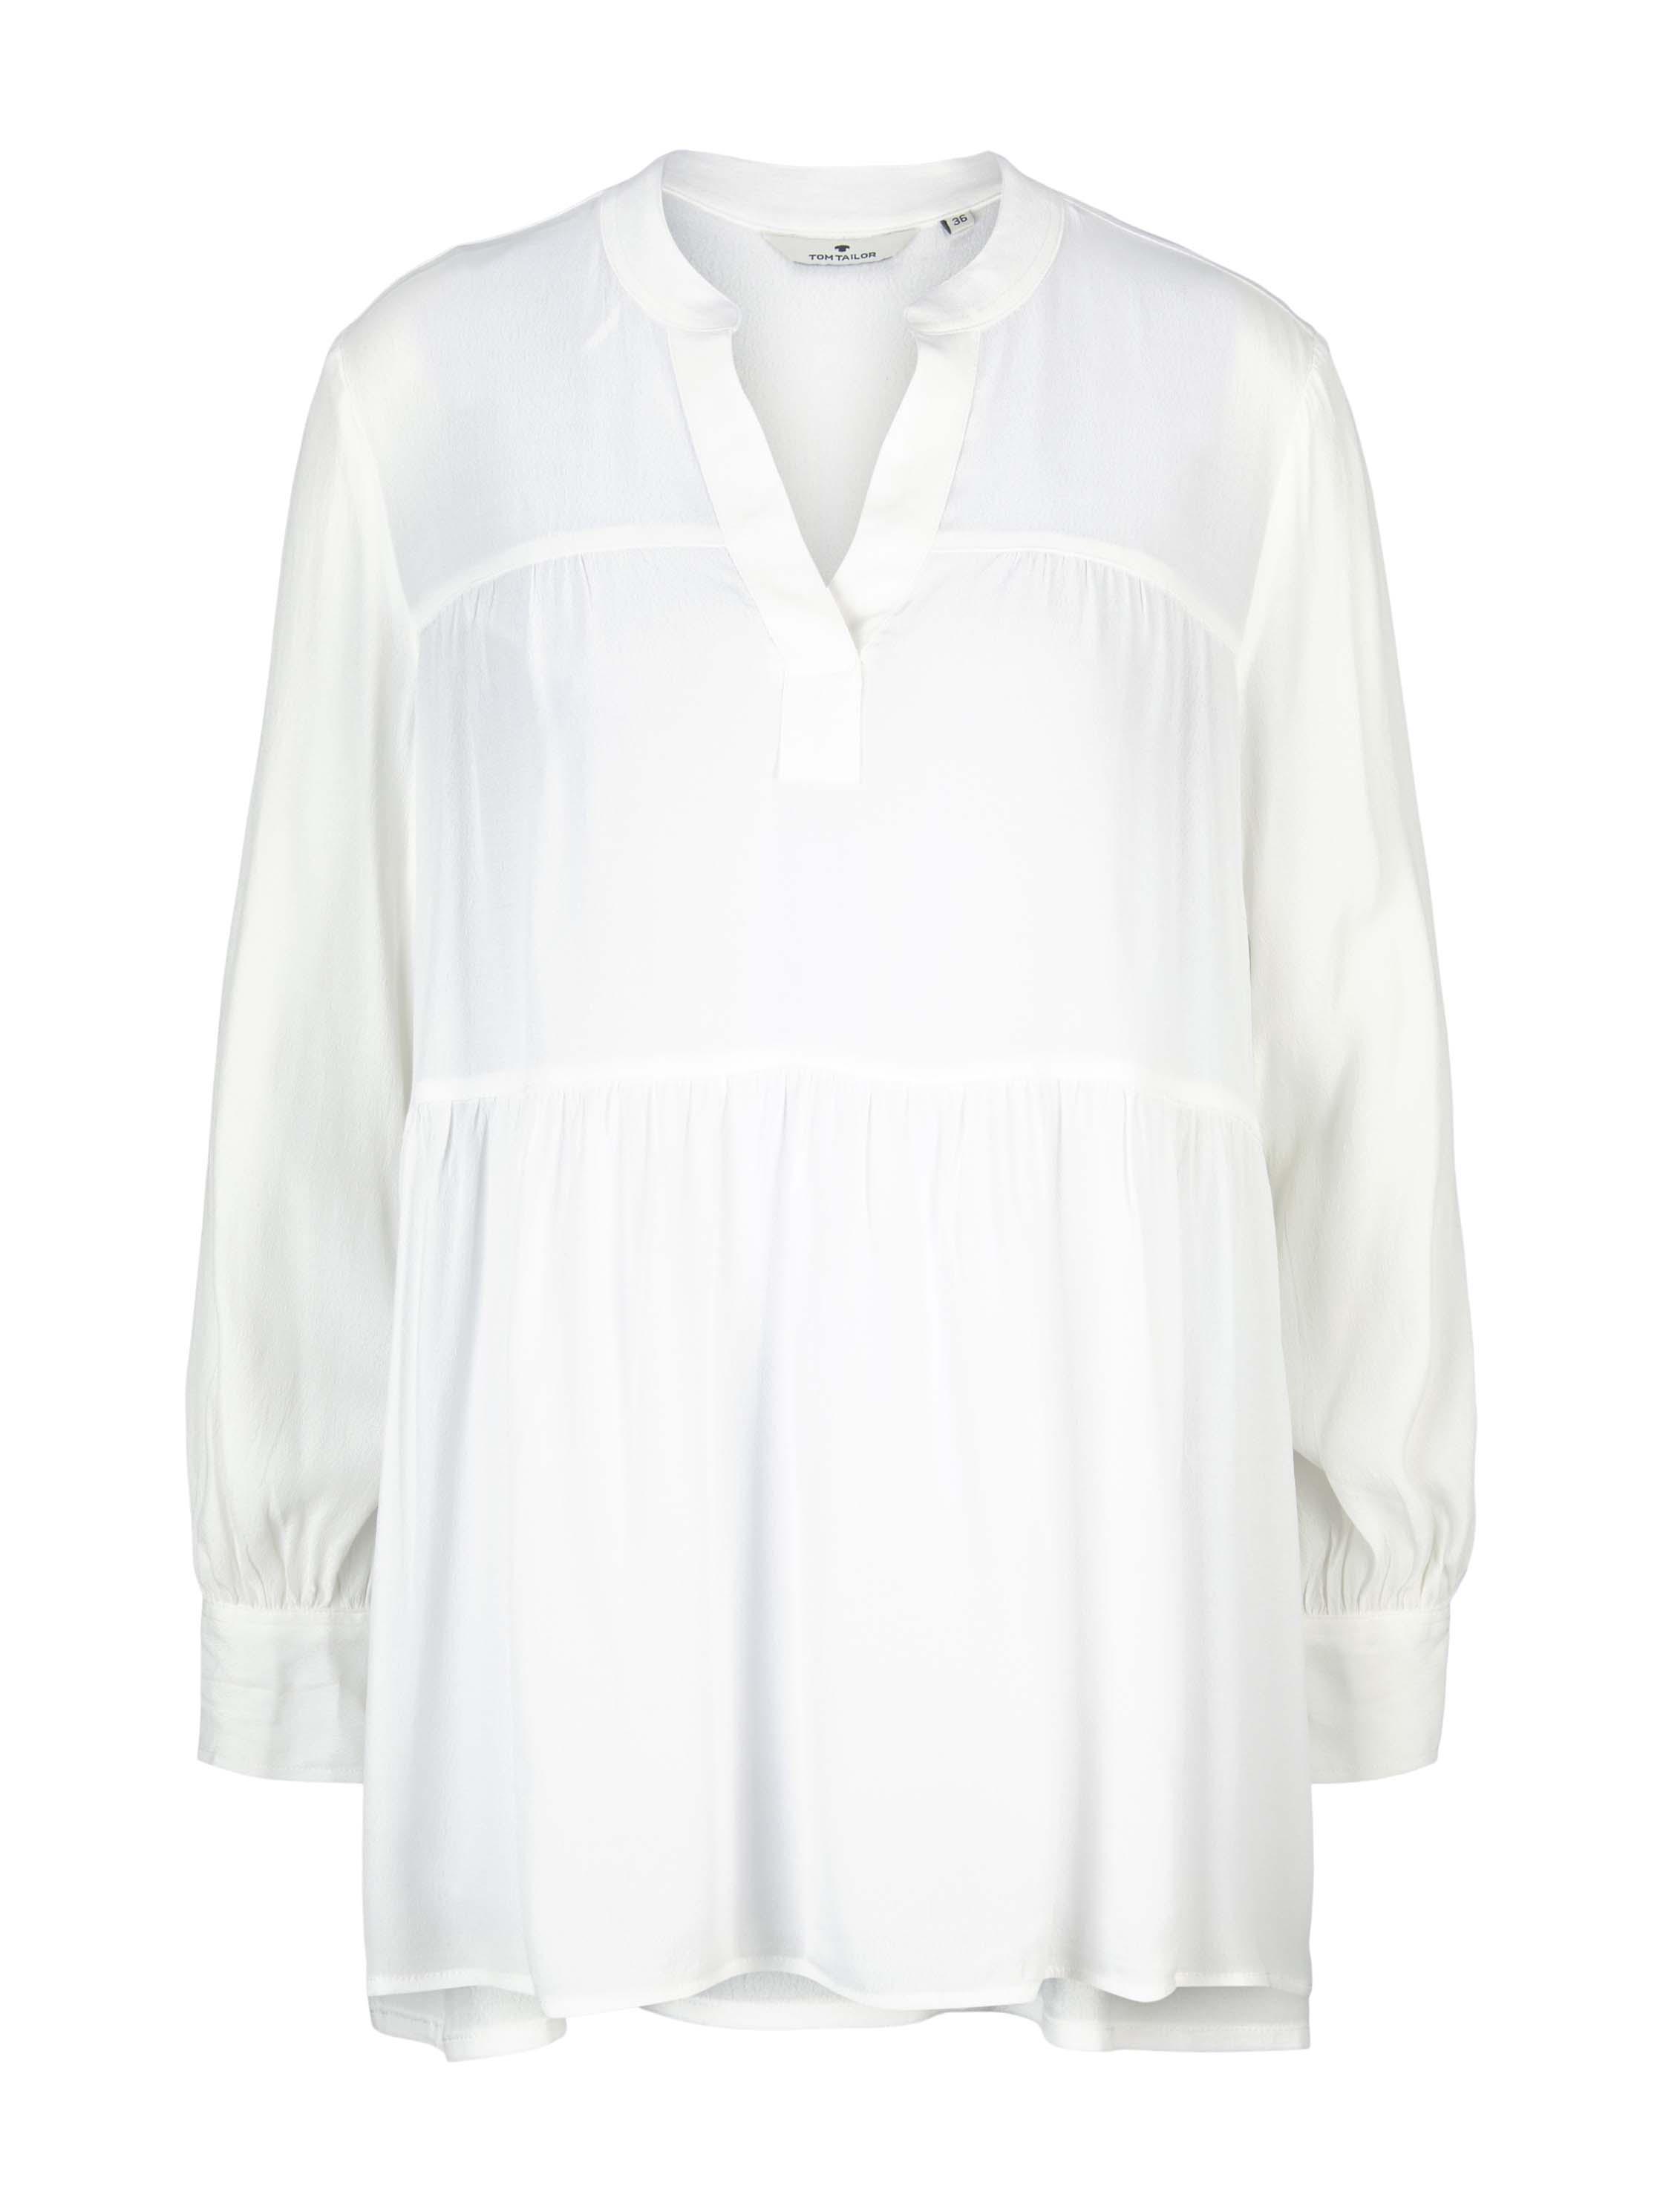 Tom Tailor Bluse im Tunika-Stil weiß